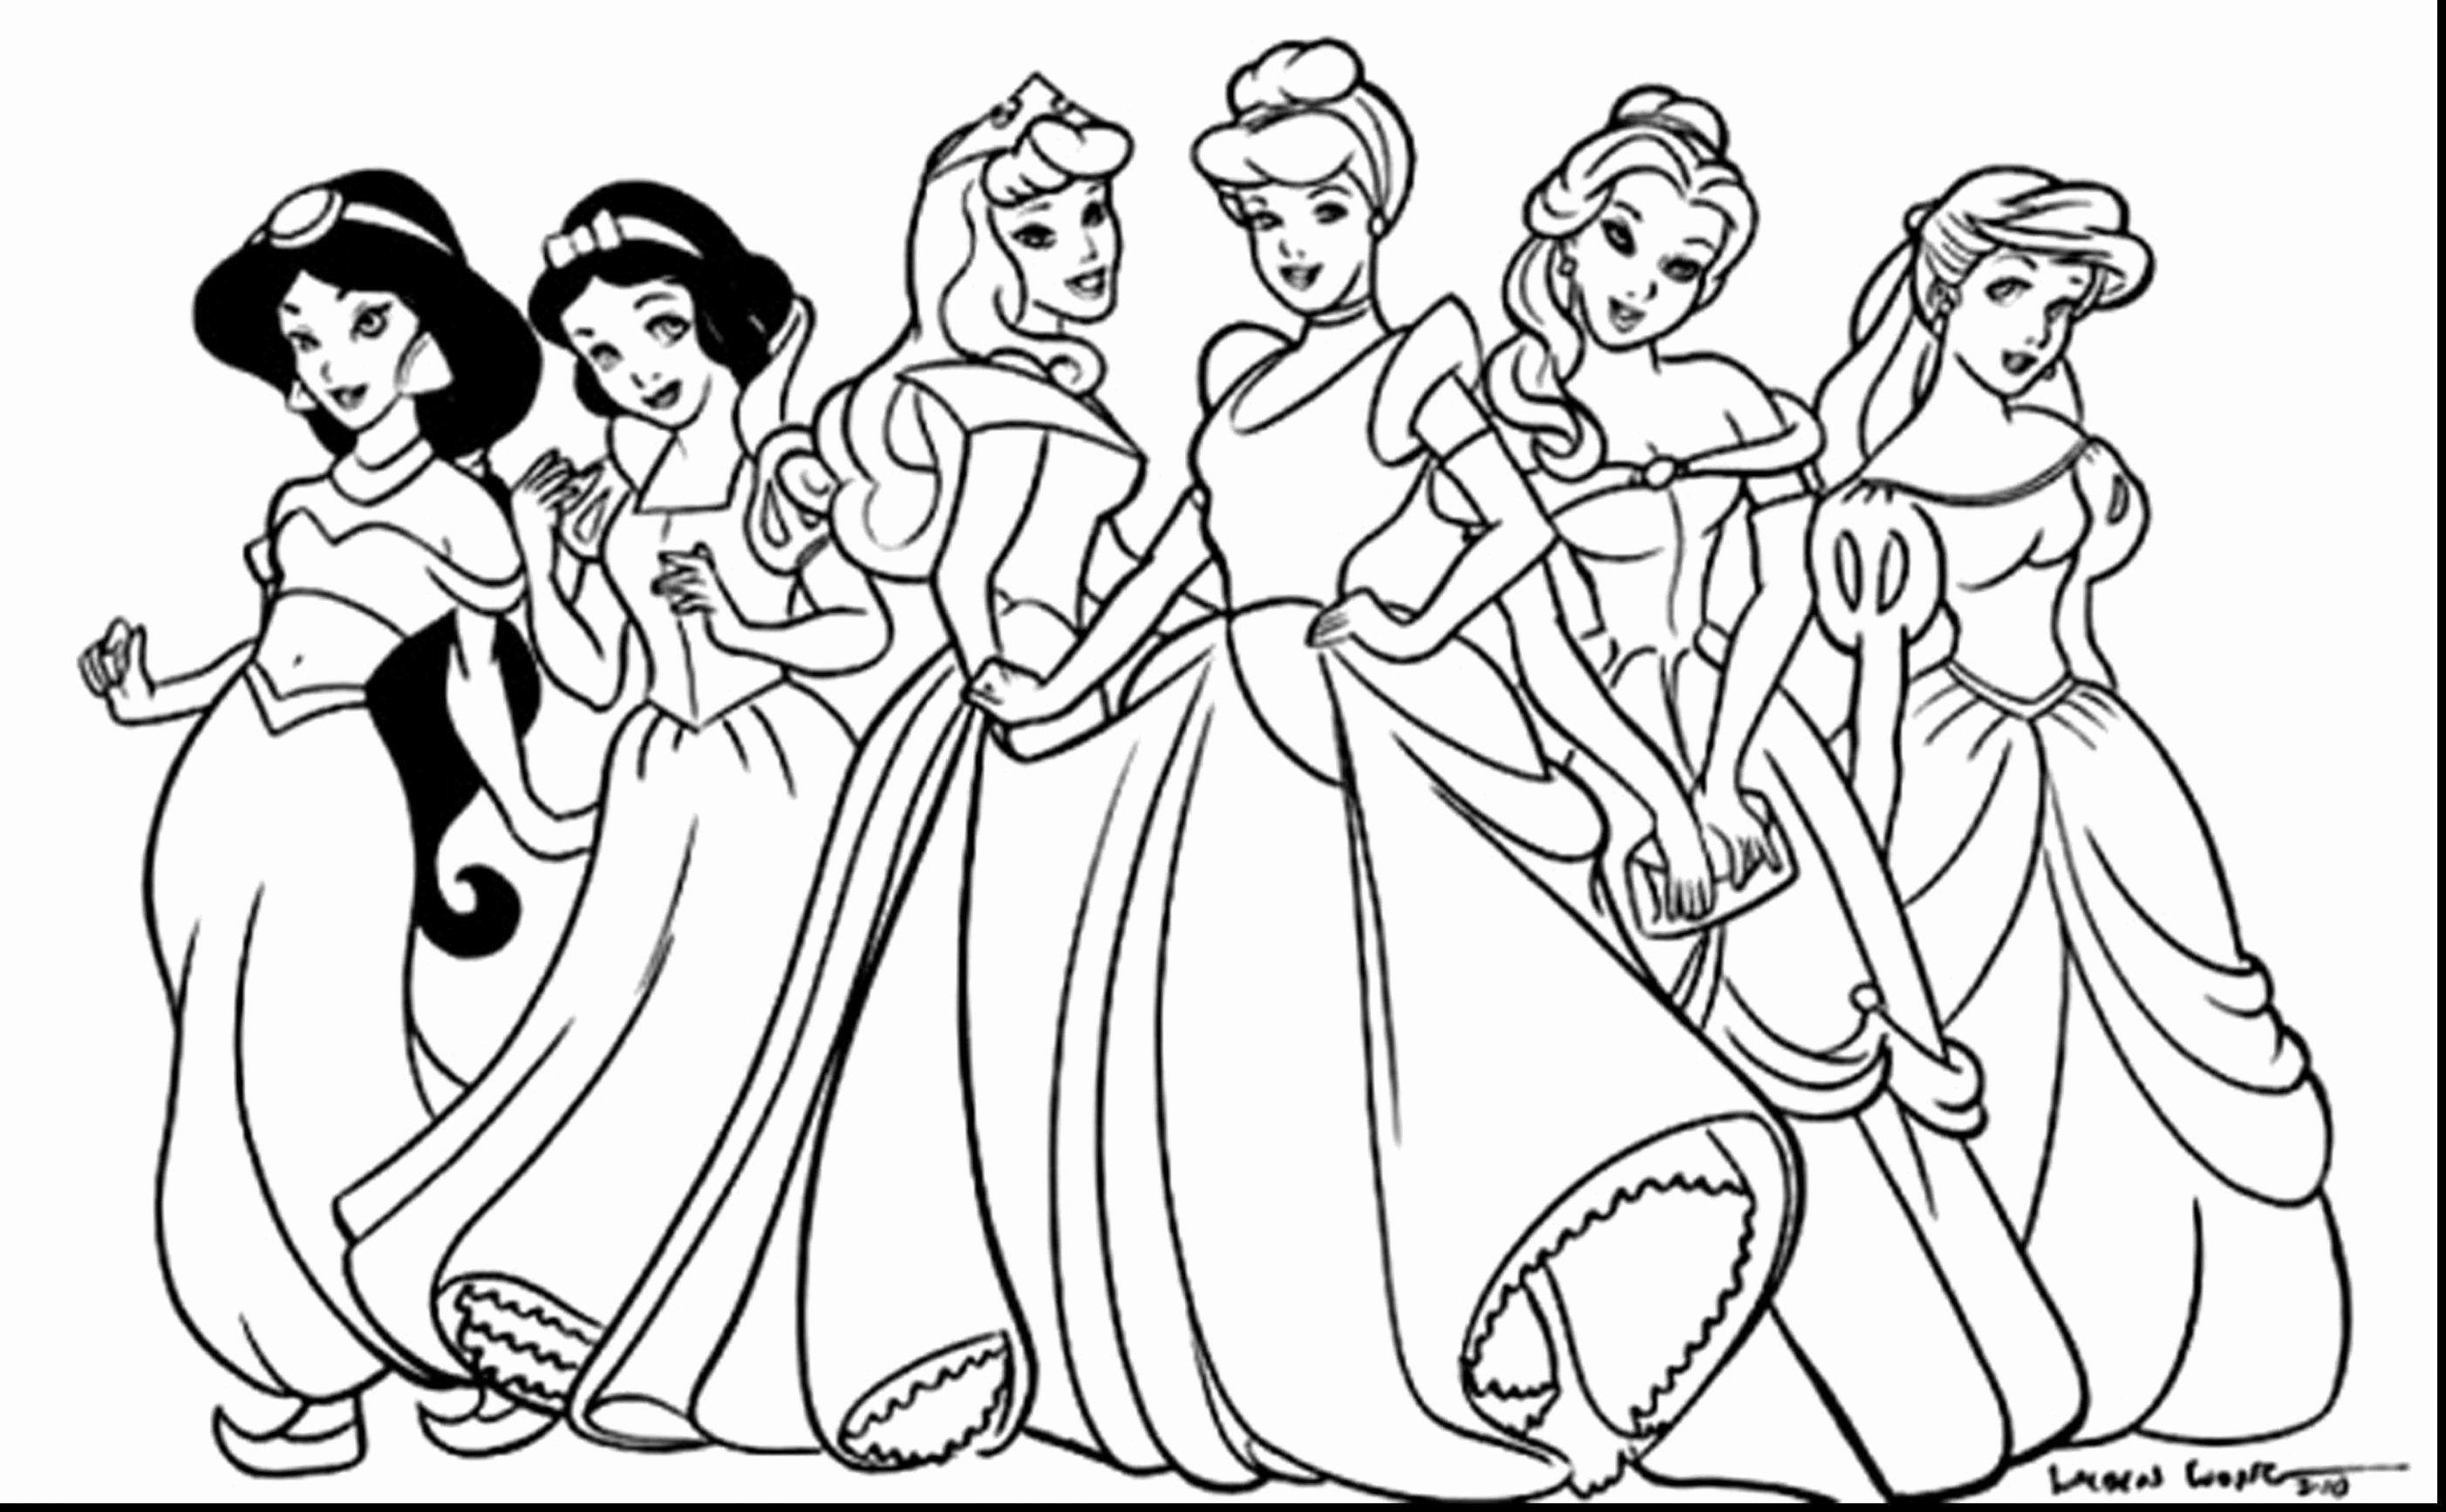 Free Pokemon Printable Coloring Pages Luxury Coloring Pages For Girls Princess Best Coloring Pages Disney Gambar Wallpaper Iphone